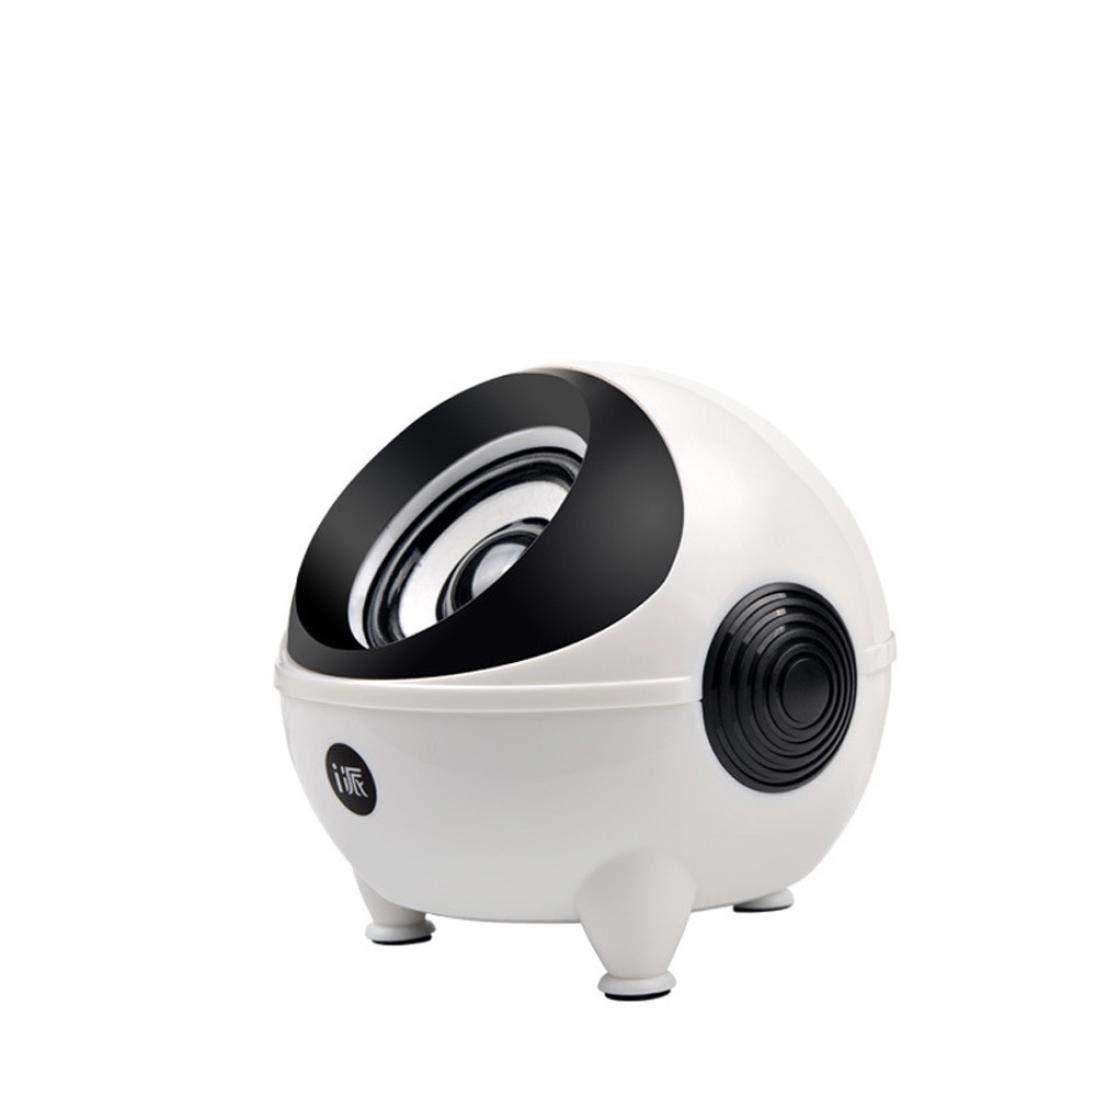 New Speaker.Likero Portable Wireless Bluetooth Card 3D Surround Bass Stereo Retro Loudpeaker